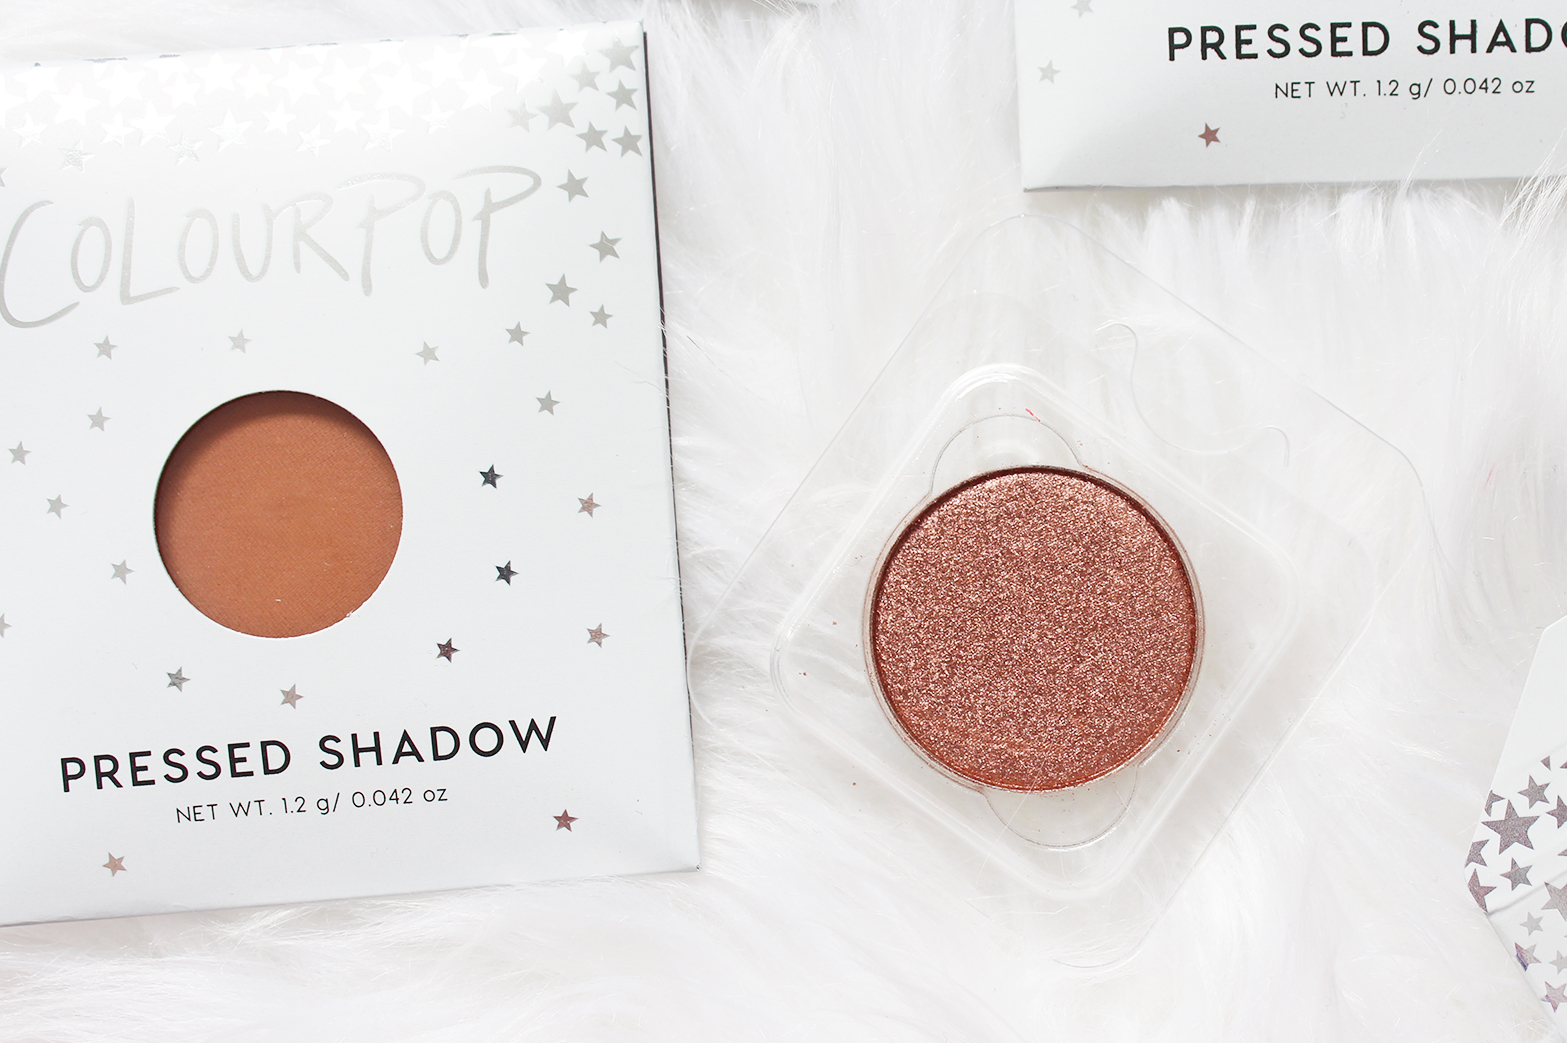 COLOURPOP COSMETICS | Brand New Pressed Shadows - Review + Swatches - CassandraMyee